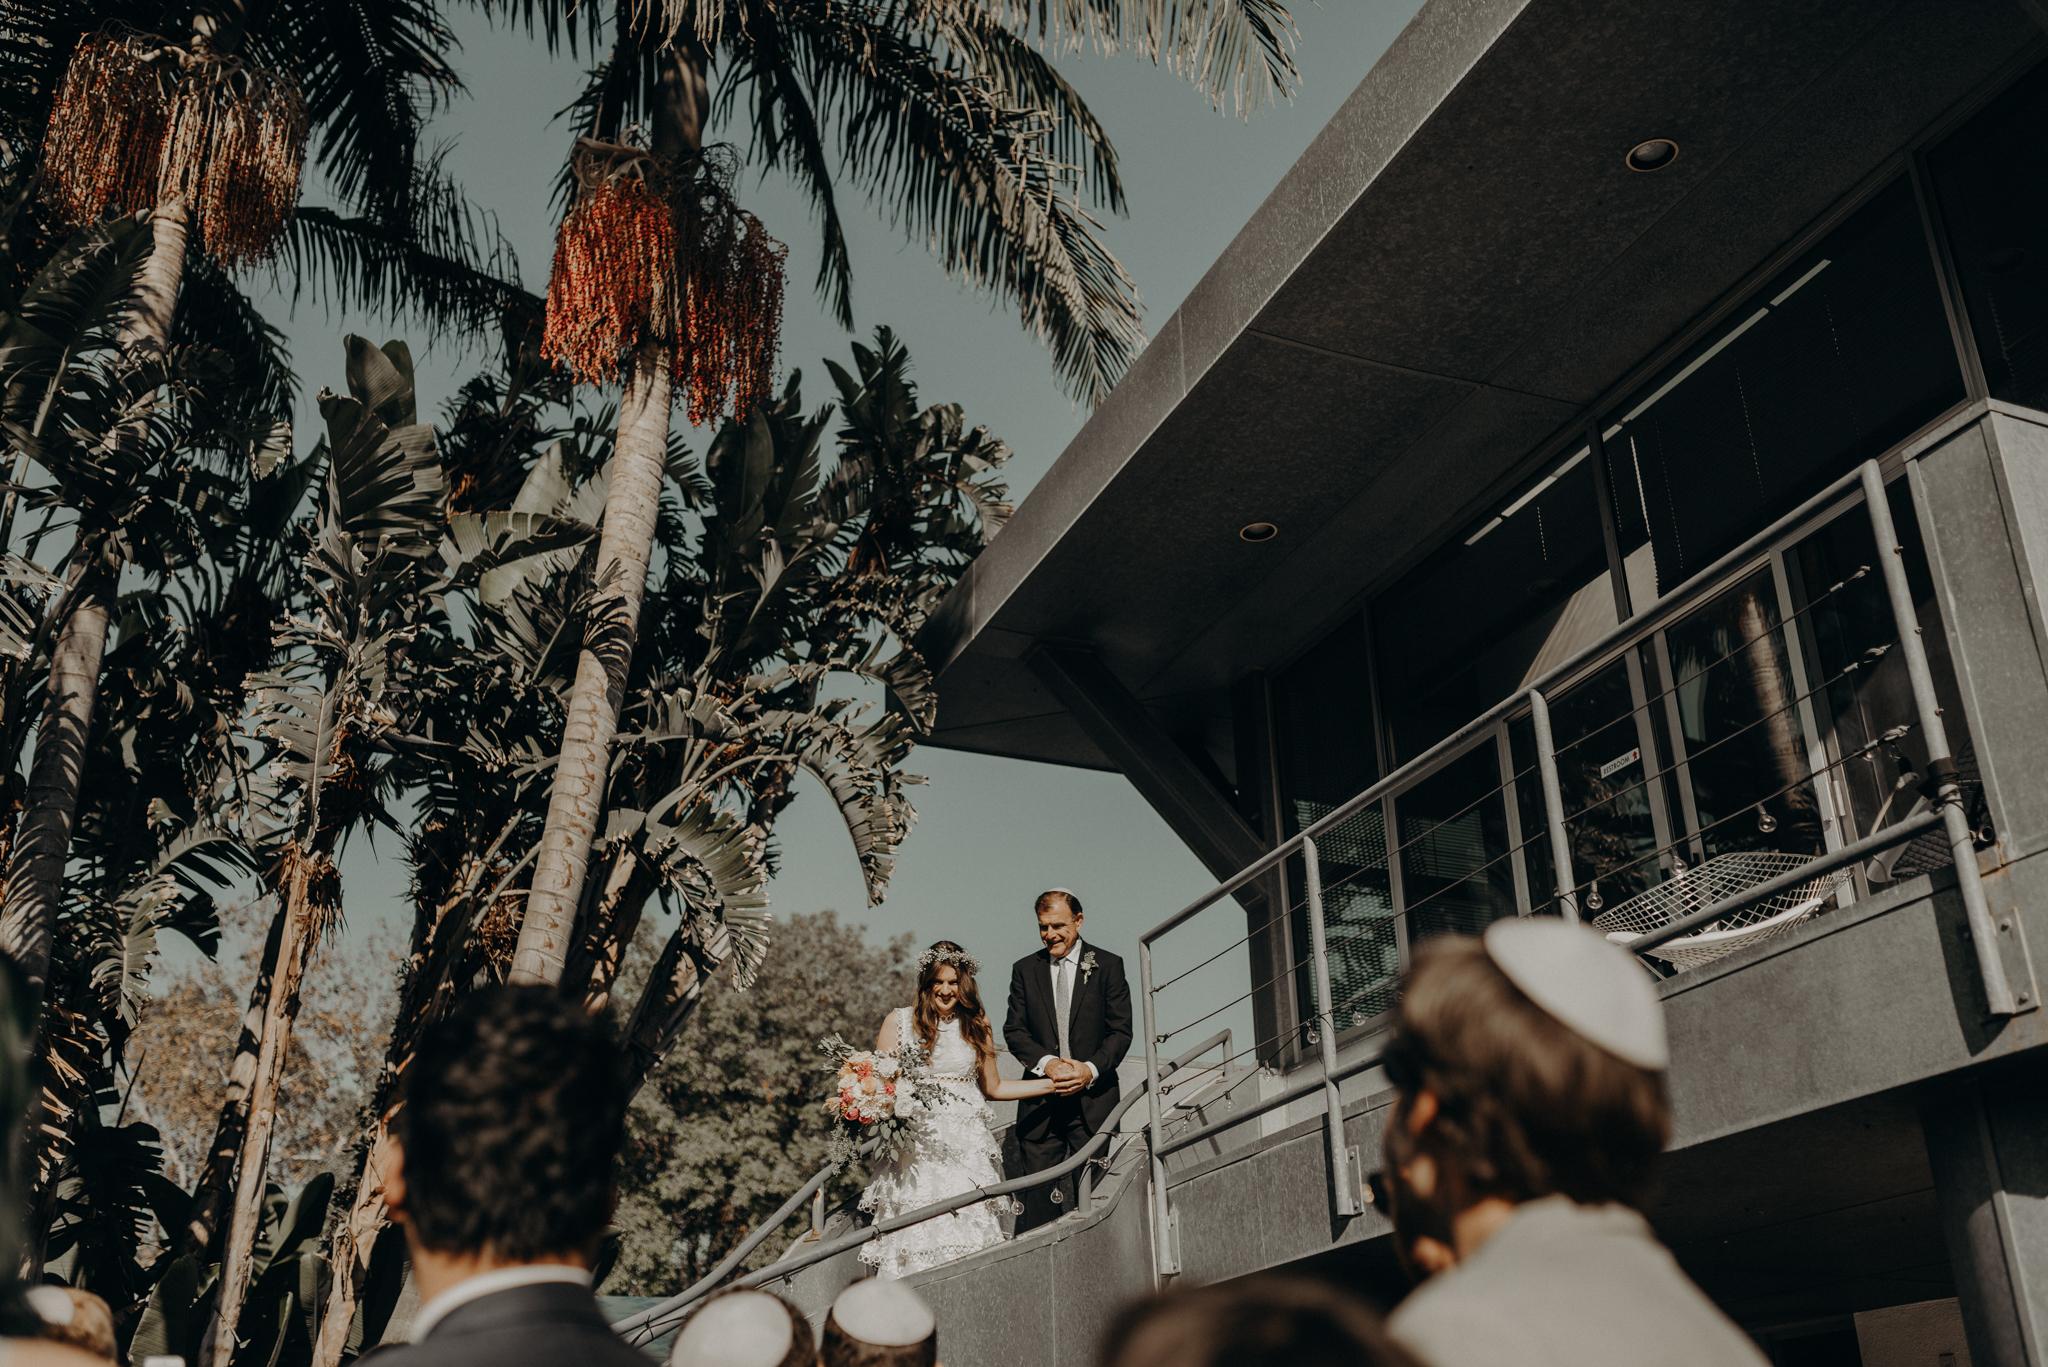 Isaiah + Taylor Photography - Private Estate Backyard Wedding - Beverly Hills - Los Angeles Wedding Photographer - 69.jpg